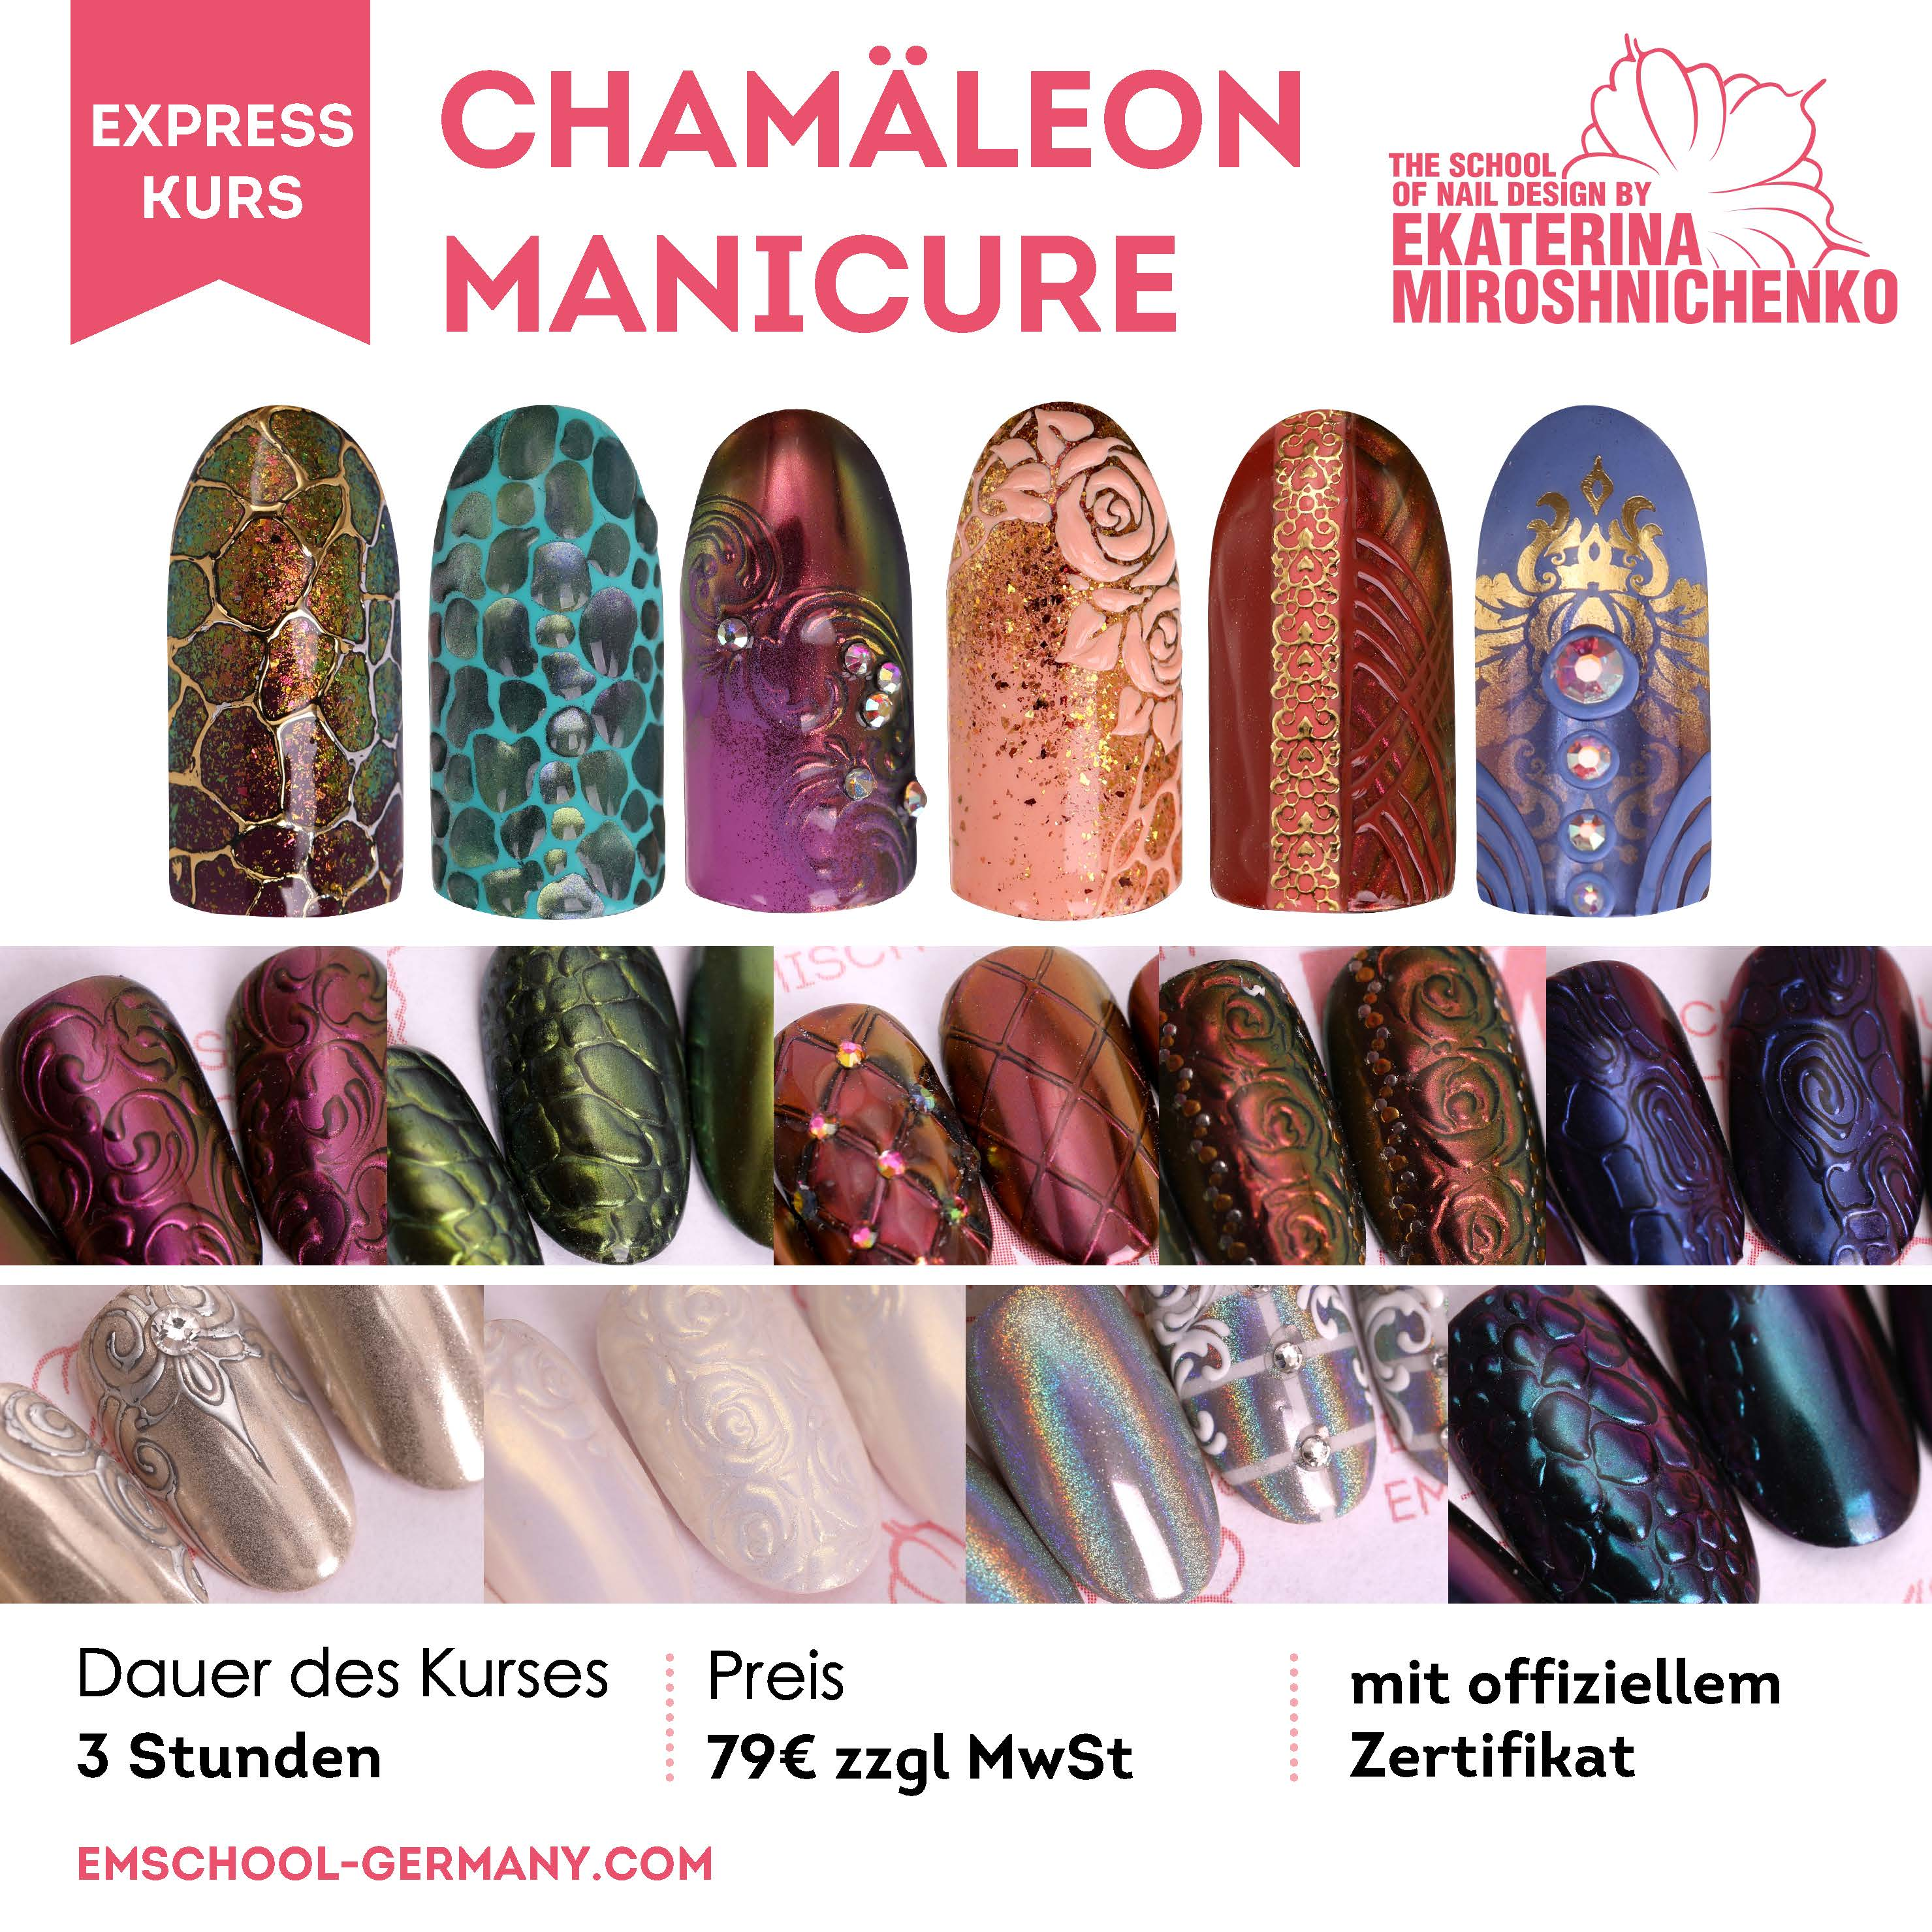 Chamäleon Manicure